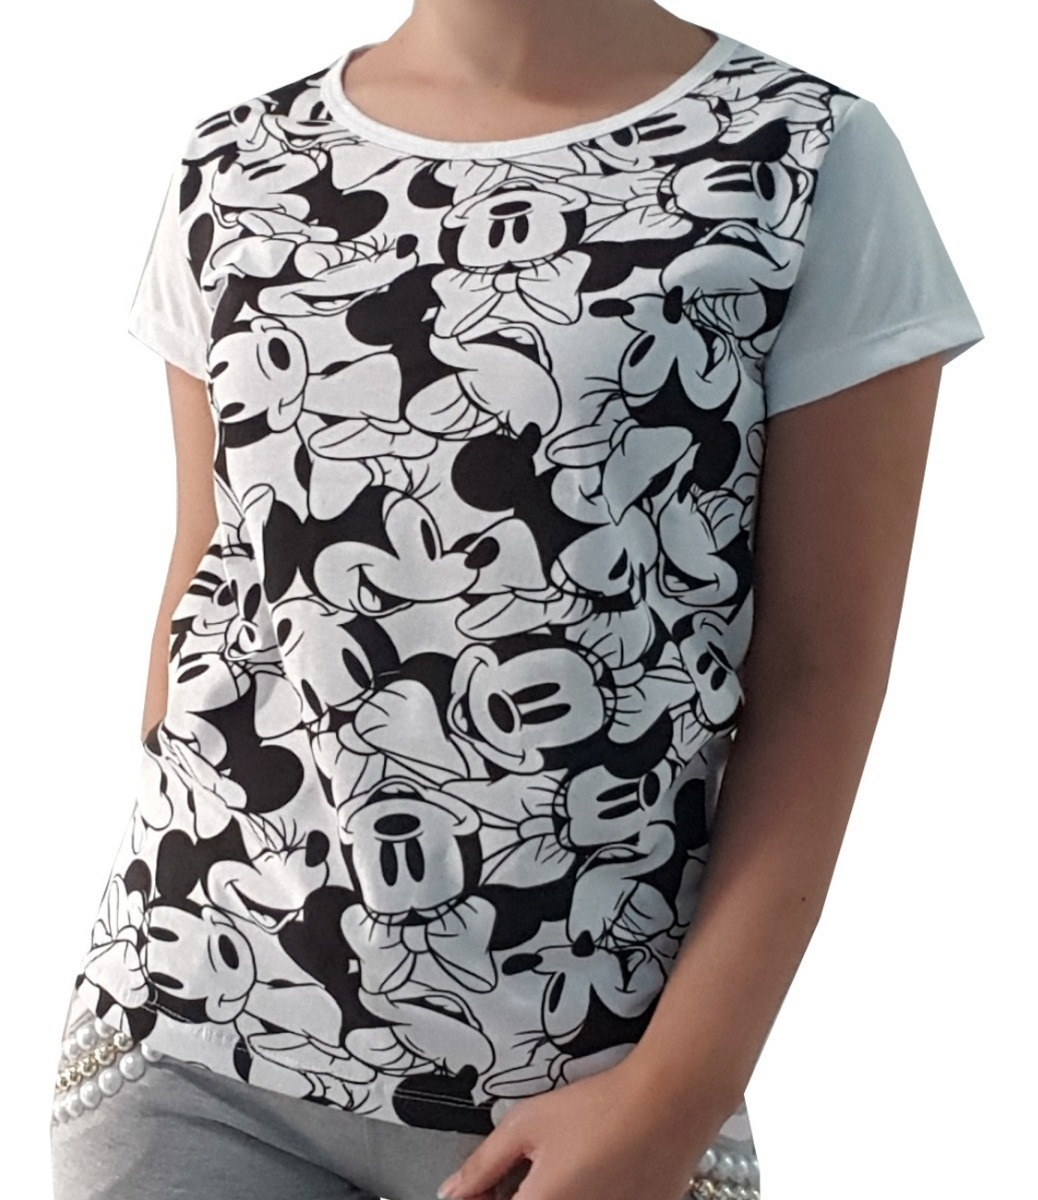 57ccb011d Atacado Kit 5 T-shirt Blusinha Camiseta Feminina Mickey Moda - R$ 90 ...